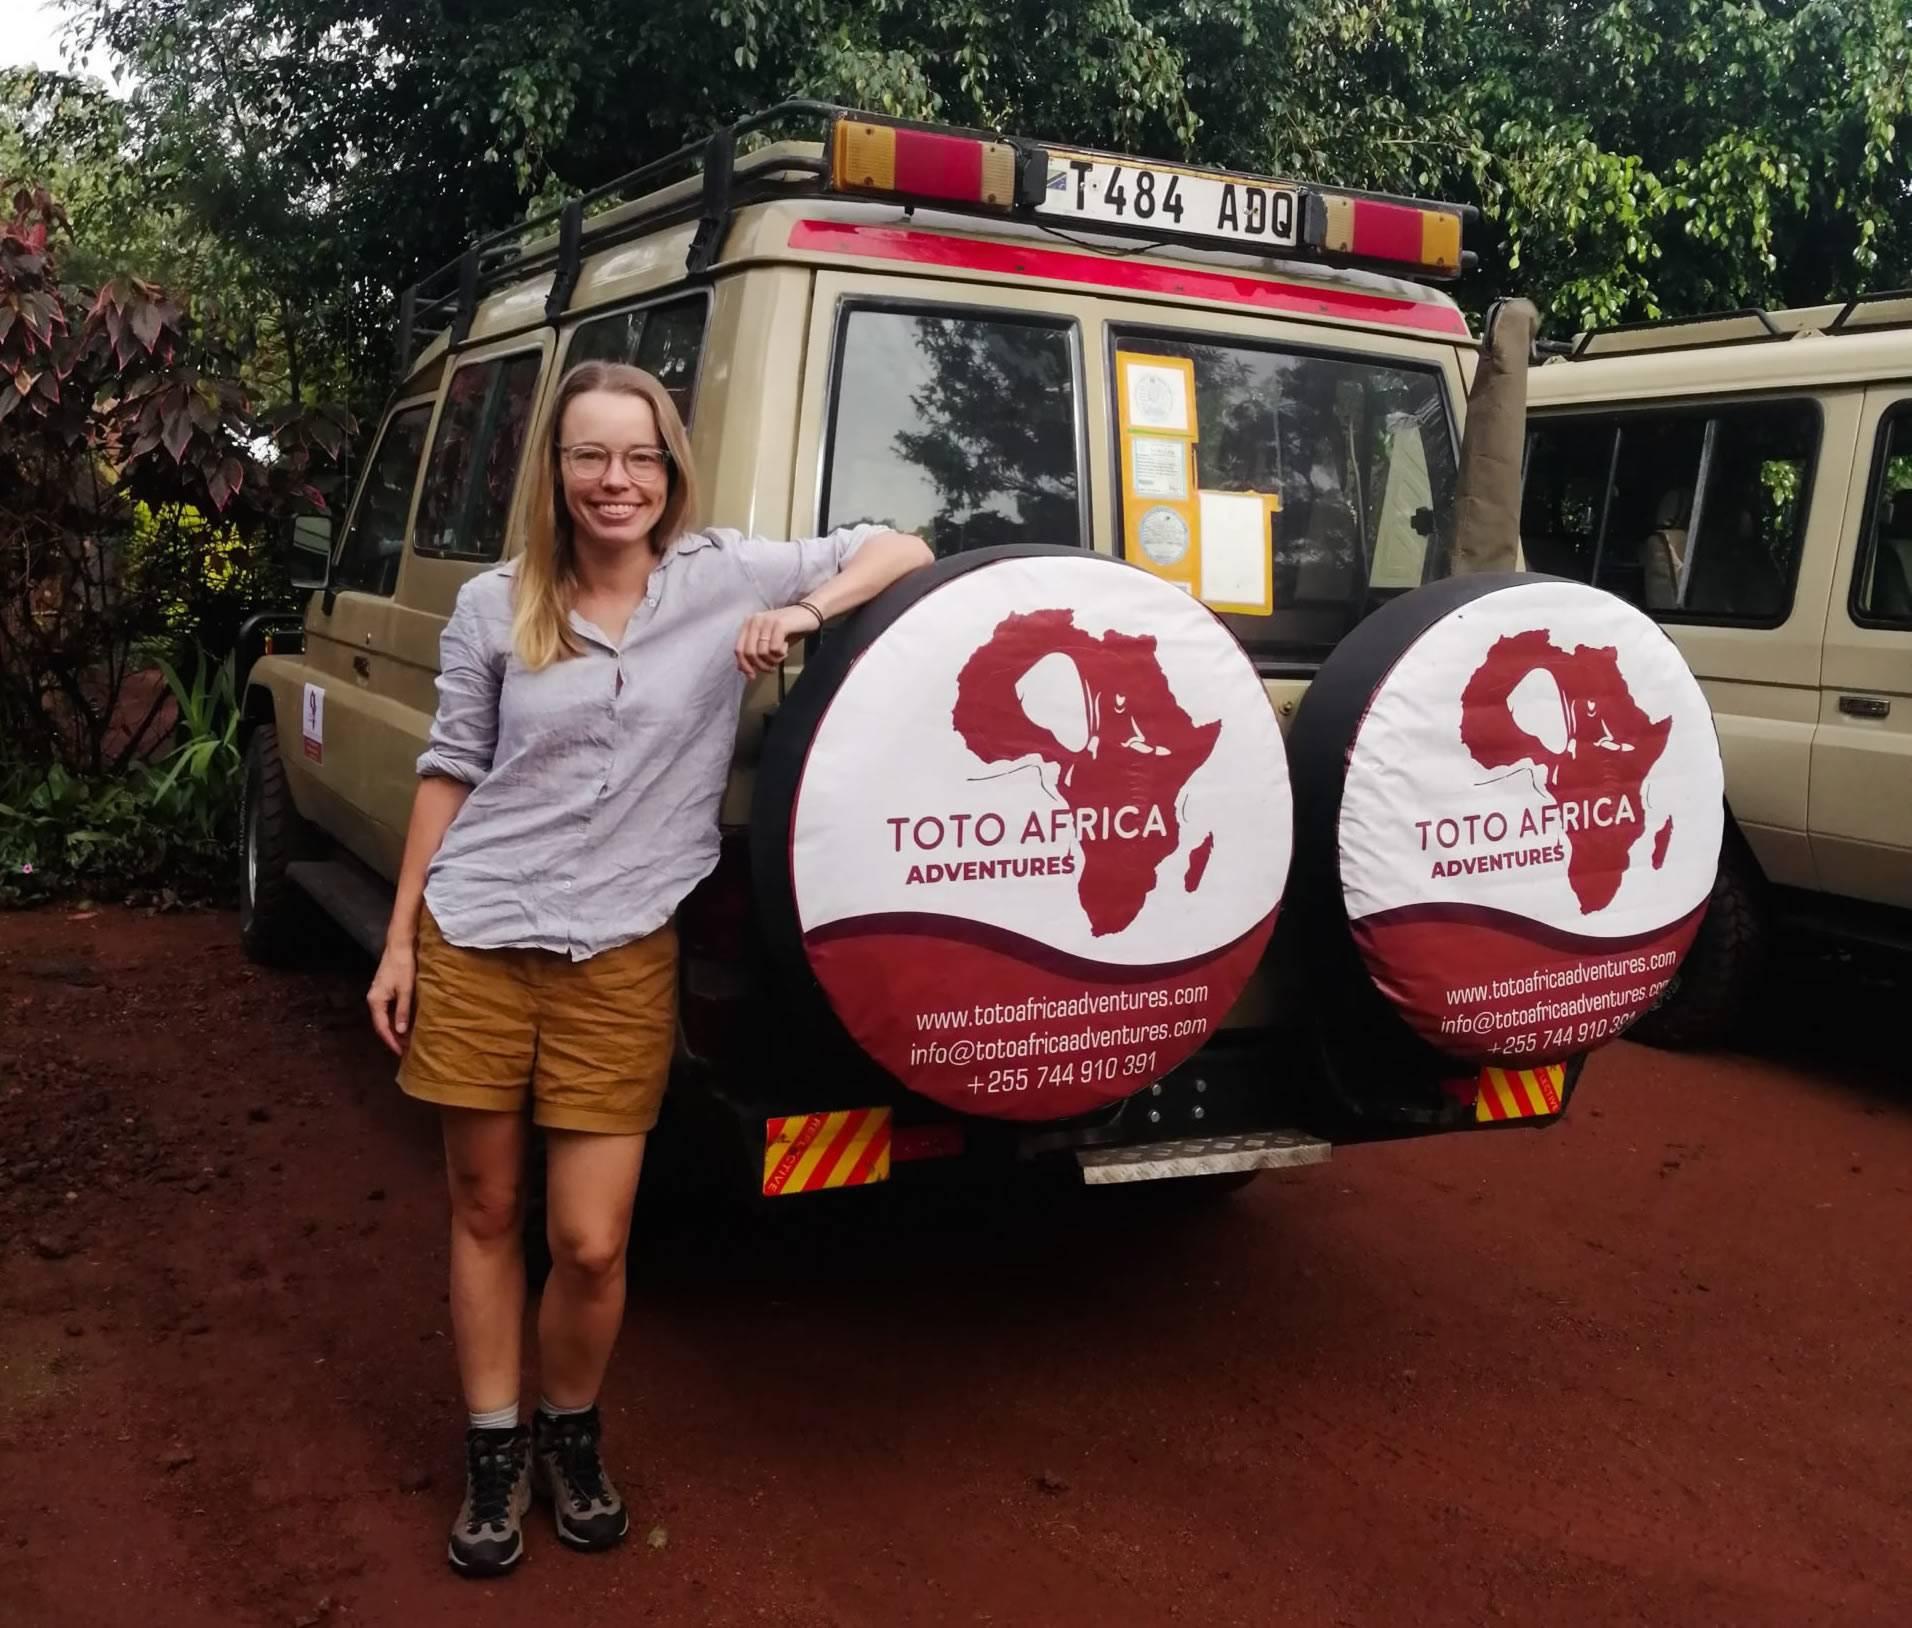 African Safari Holidays   Kilimanjaro climbing tours and packages   Tanzania Family Safari